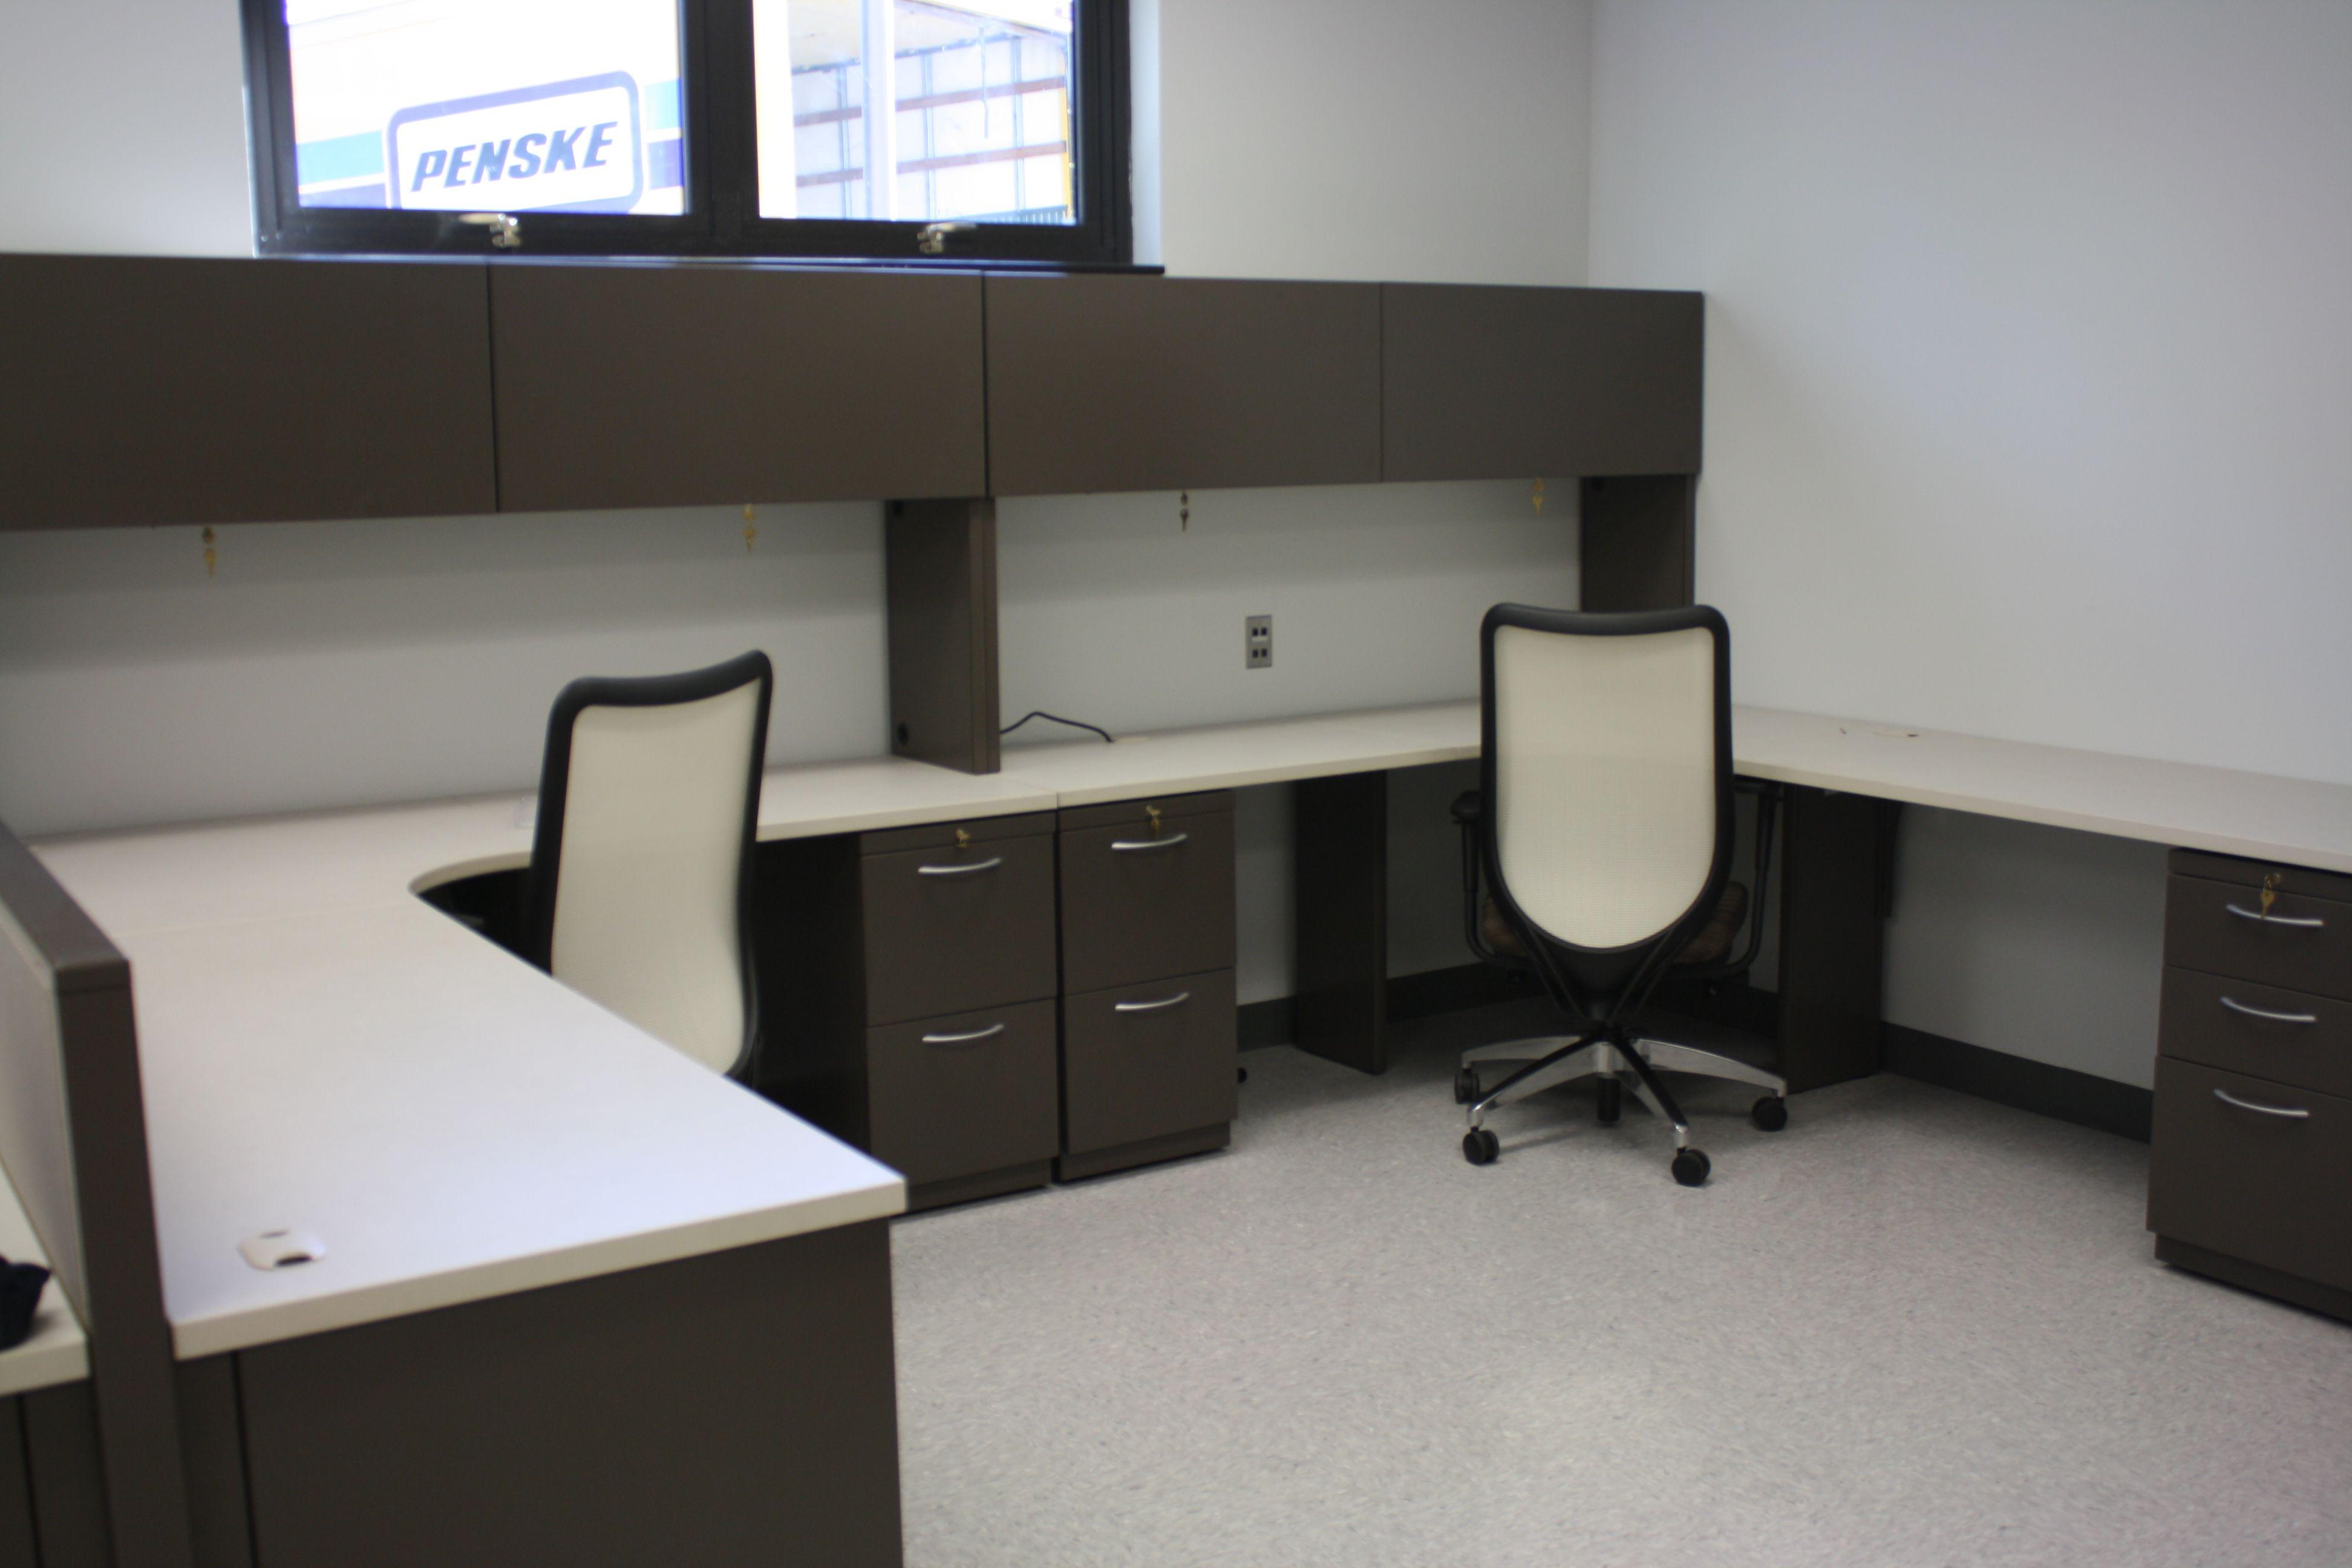 ... Allsteelu0027s Nucleus Chairs   Herald Office Solutions Columbia, SC  Charleston, SC Dillon, SC Myrtle Beach, SC Cheraw, SC Sumter, SC Greenwood,  SC Sumter, ...